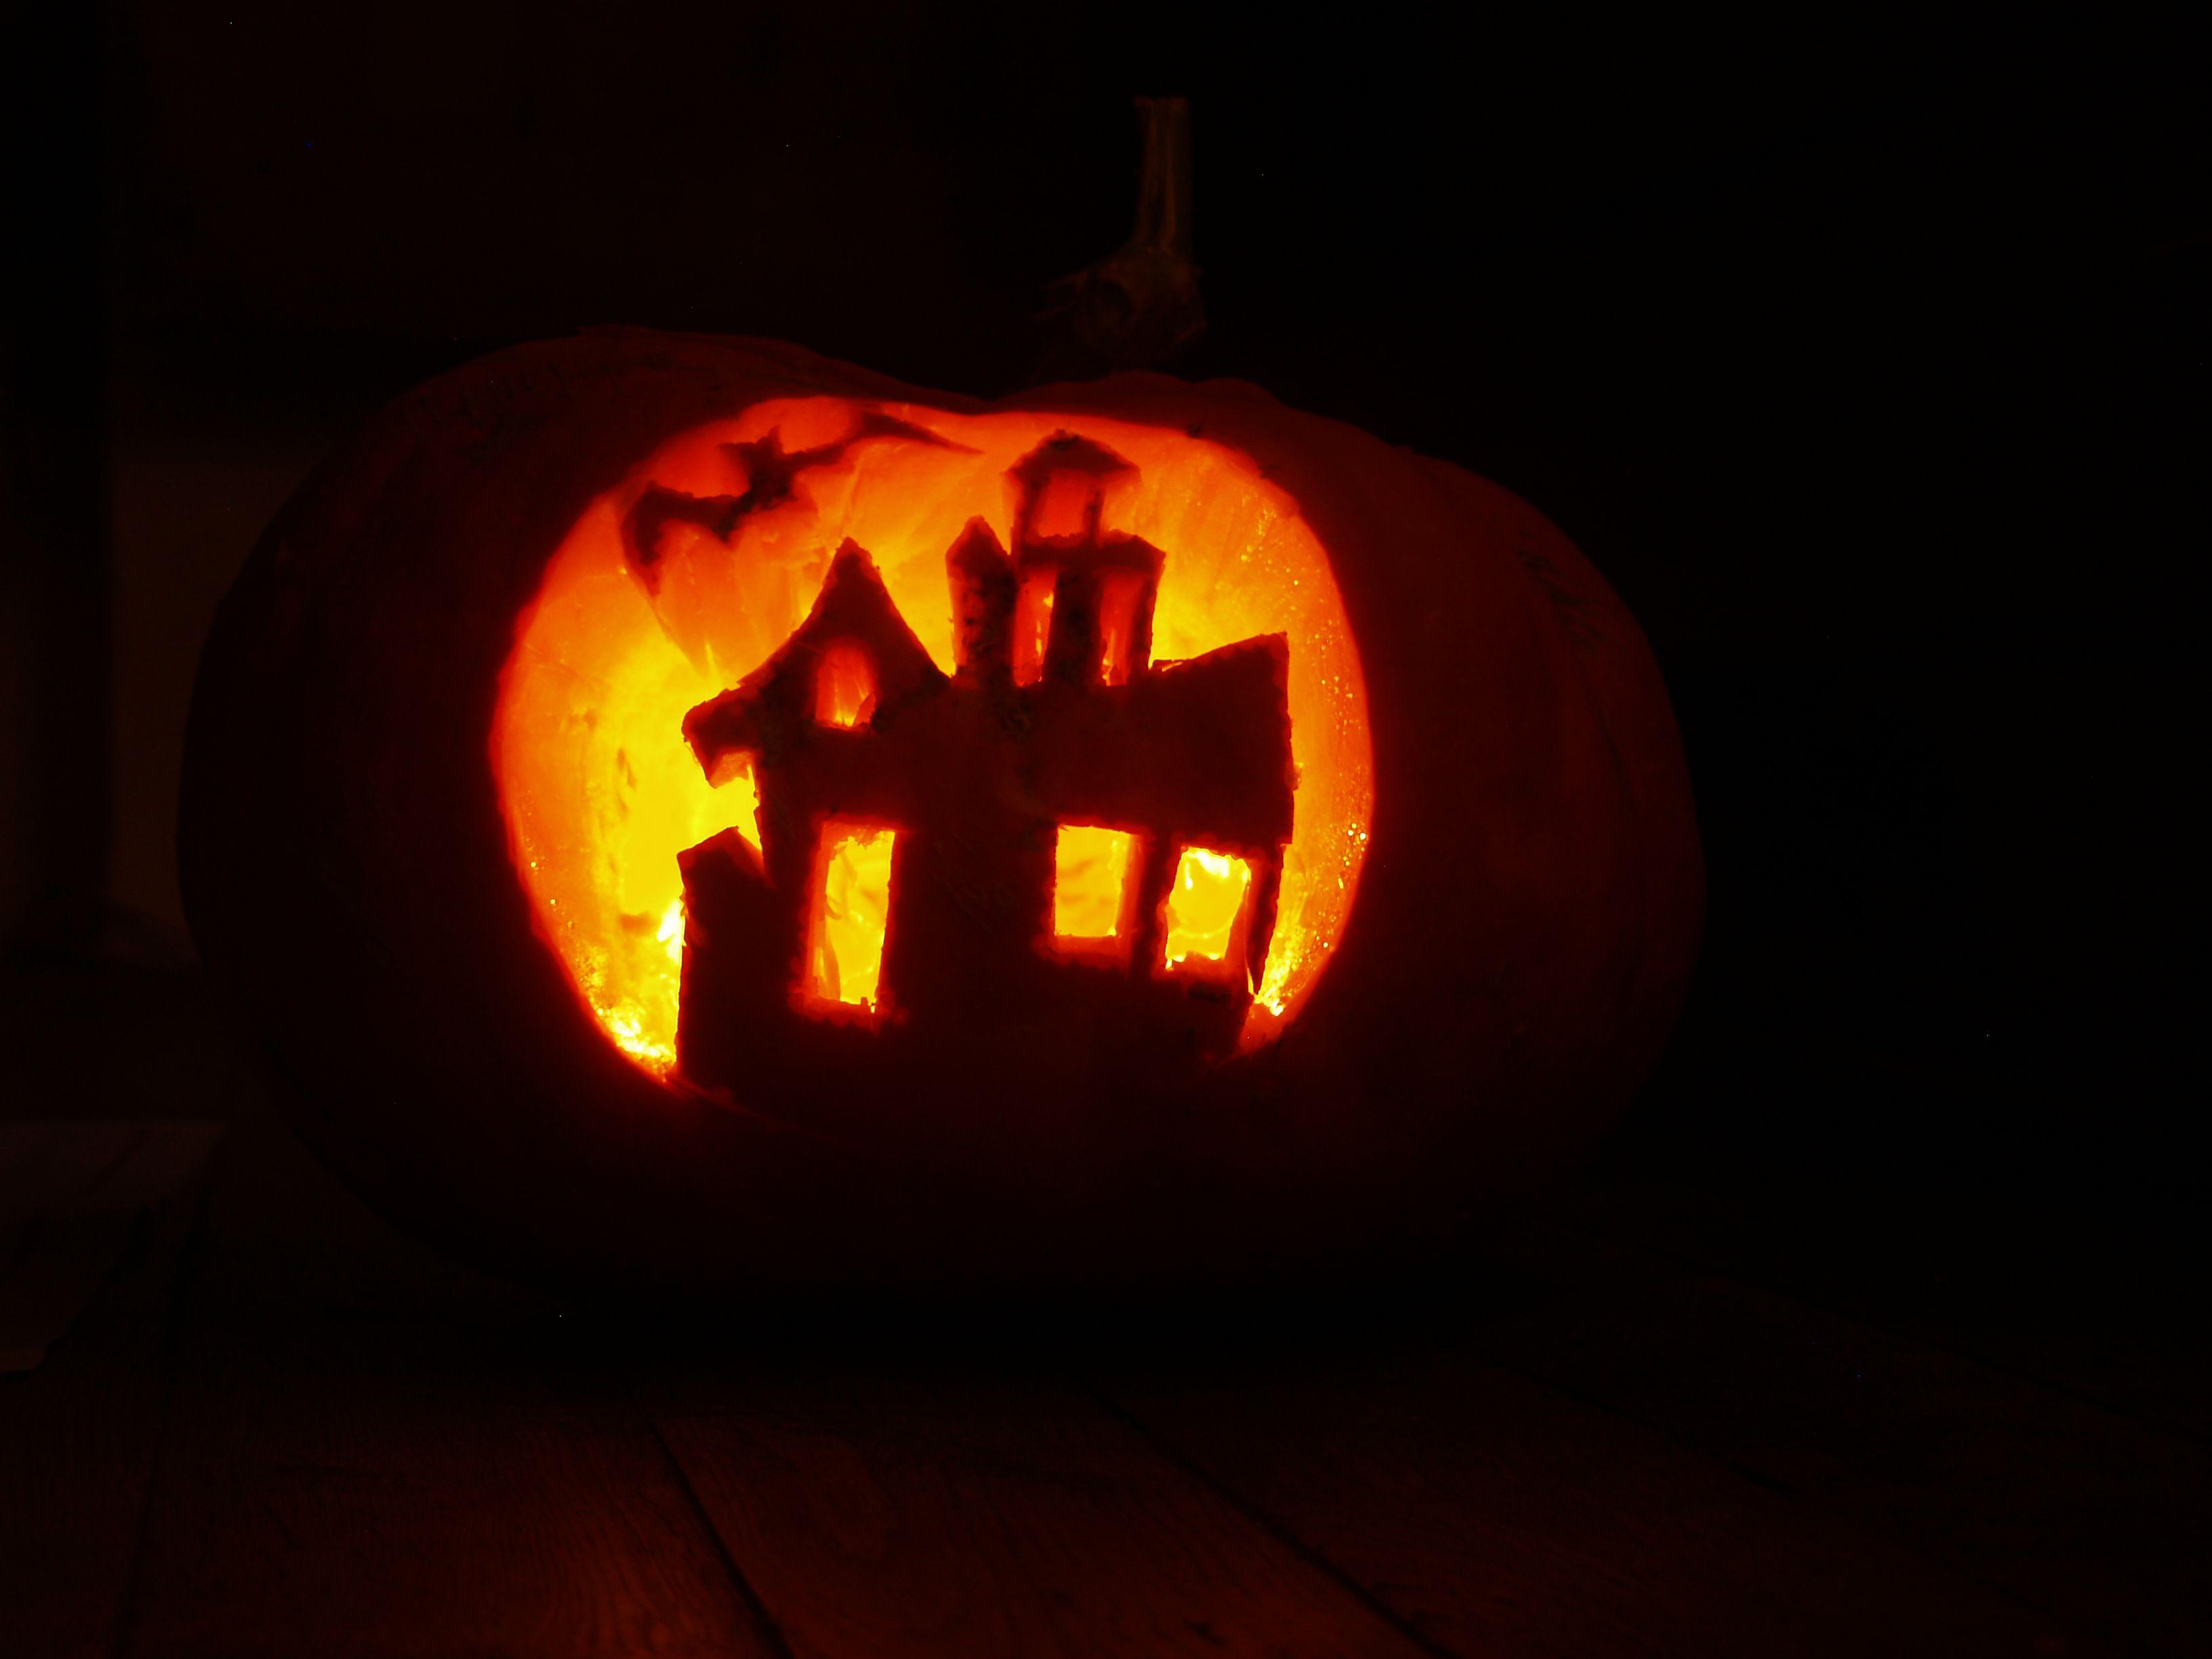 Haunted house | Halloween | Pinterest | Haunted houses, Pumpkin ...